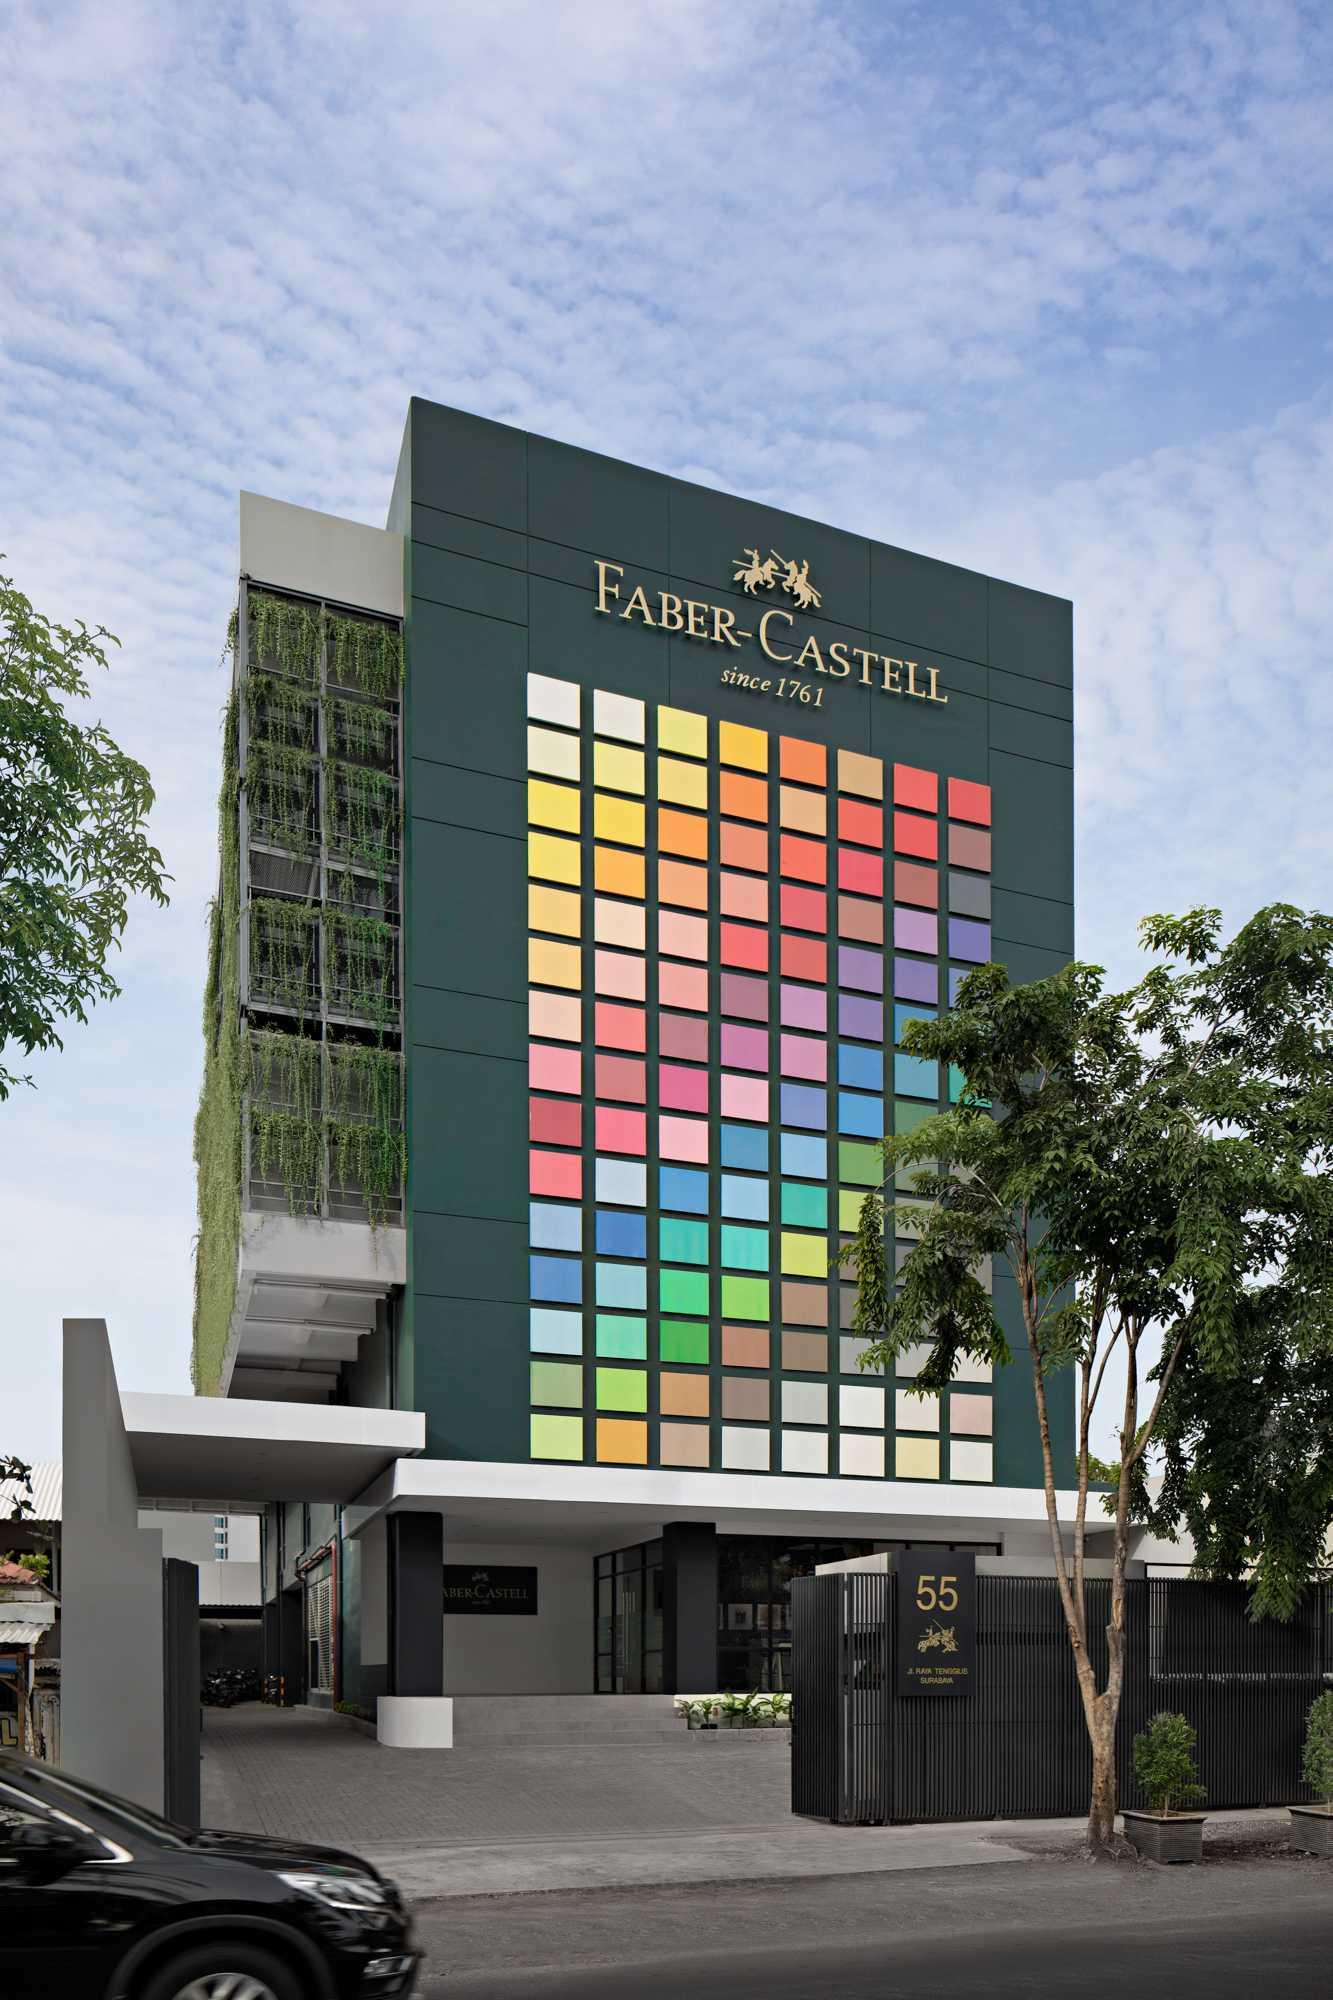 Best Group Design Studio Faber Castell International - Surabaya Surabaya, Kota Sby, Jawa Timur, Indonesia Surabaya, Kota Sby, Jawa Timur, Indonesia Best-Group-Design-Studio-Faber-Castell-International-Surabaya  88493